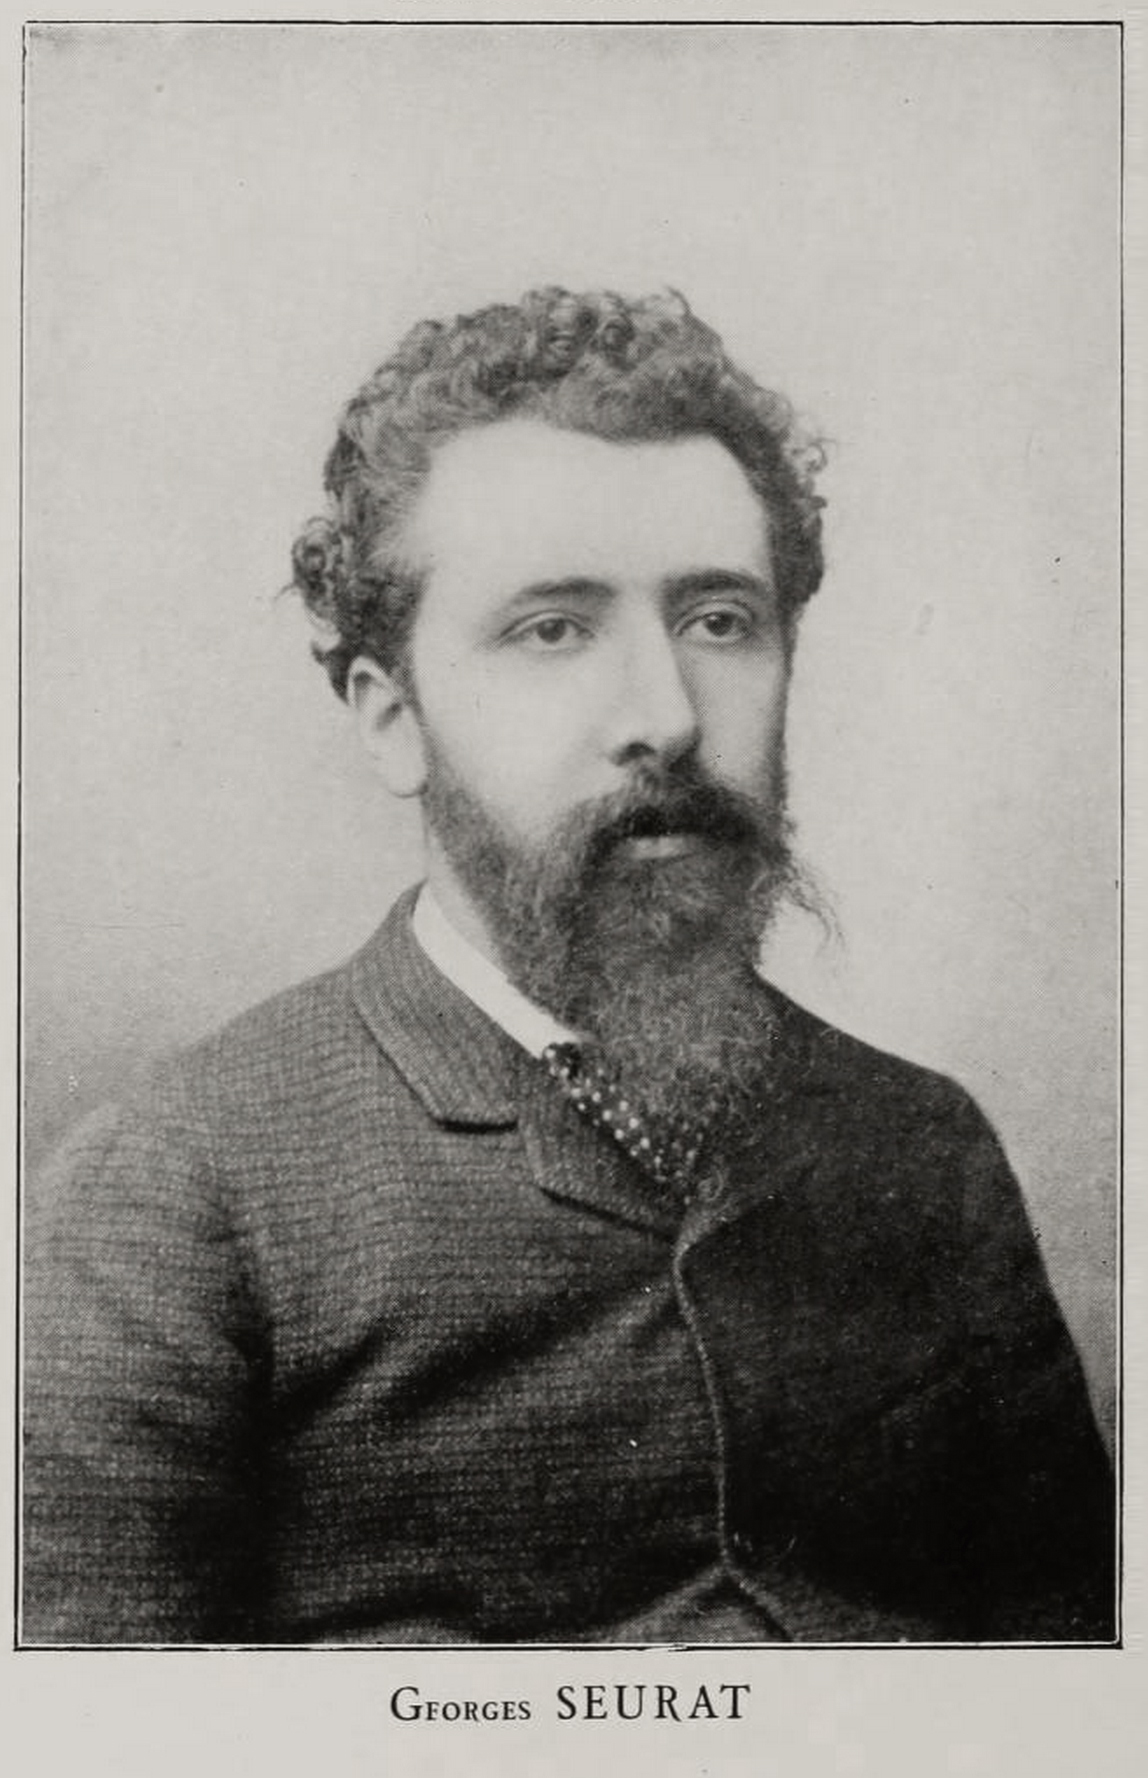 Georges Seurat (1859-1891), photo